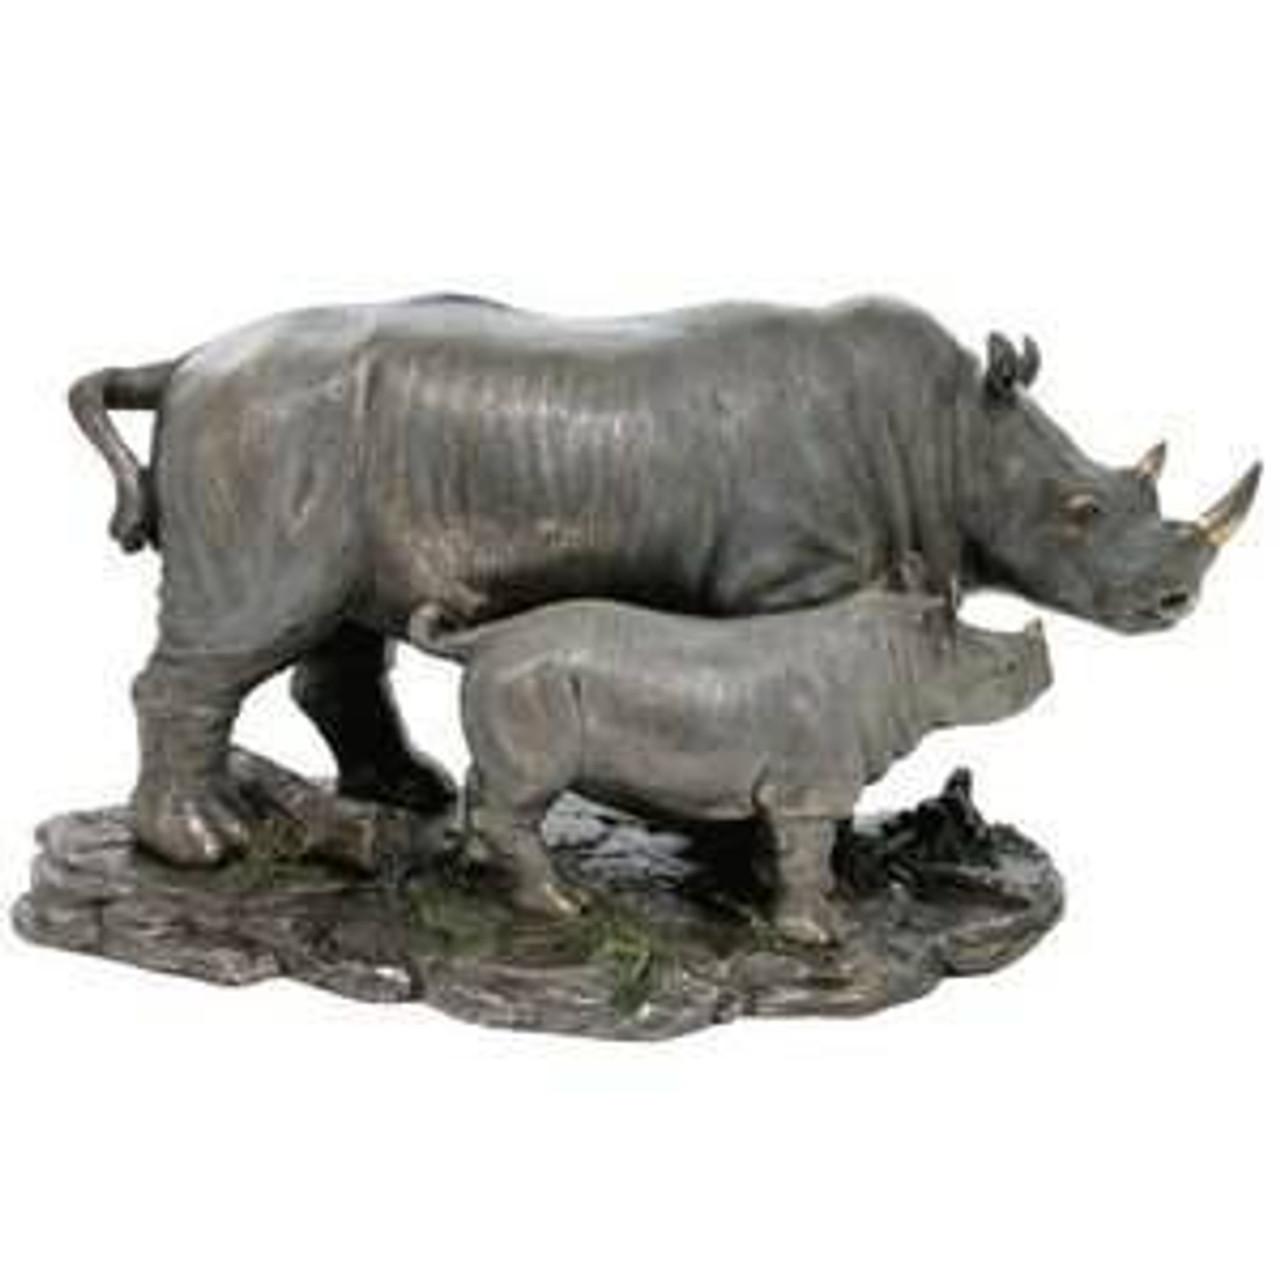 Rhino Sculptures